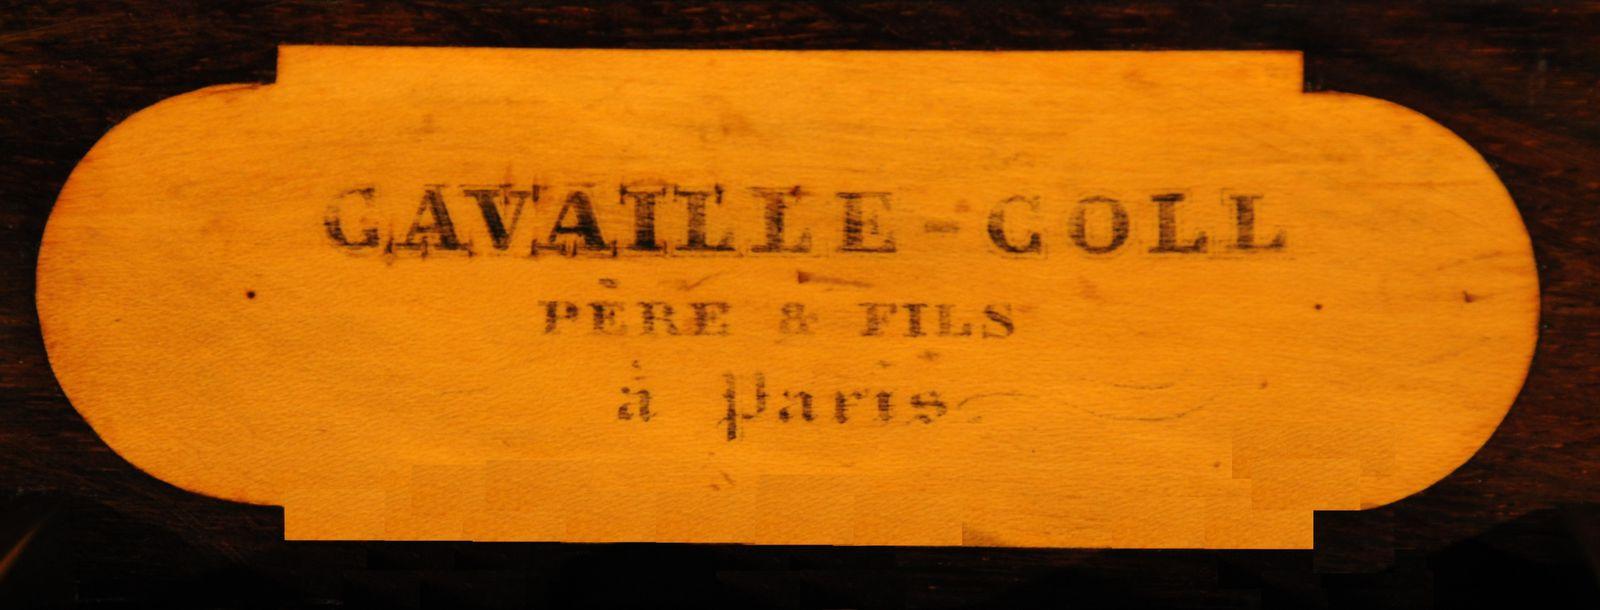 Orgue Cavaillé-Coll de 1843.